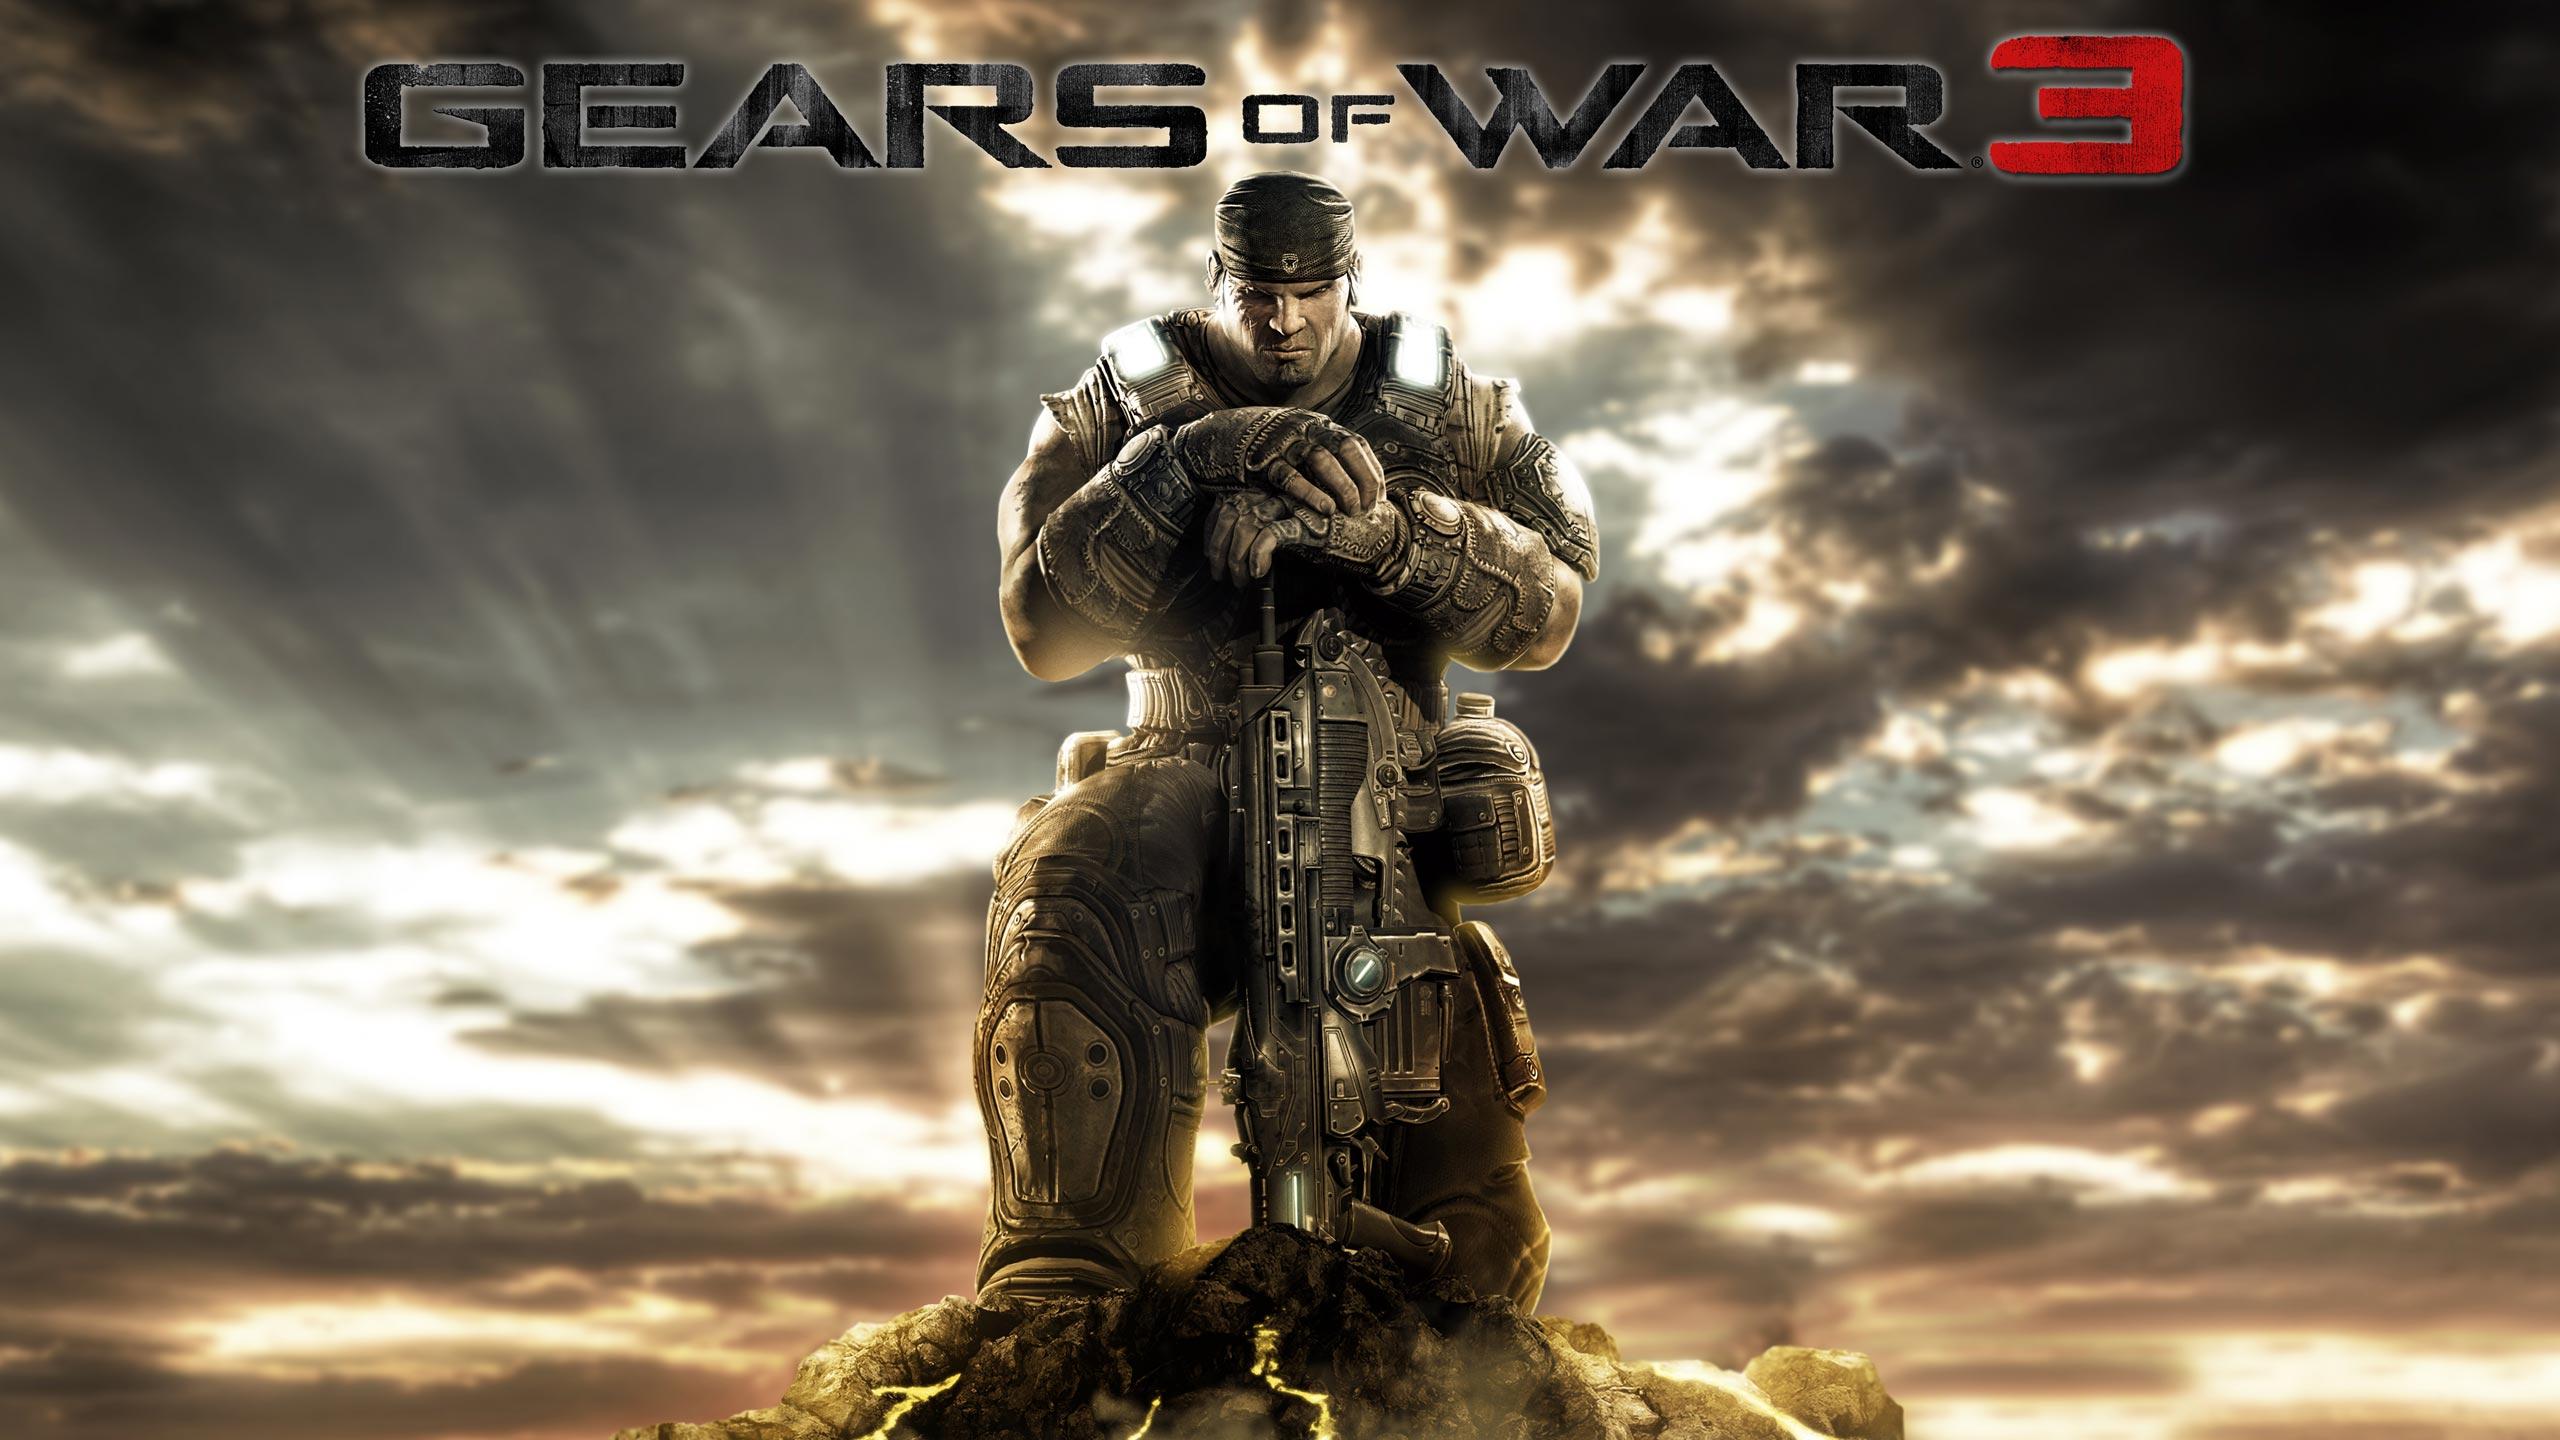 Gears of war 3 wallpaper wallpapersafari - Gears of war carmine wallpaper ...